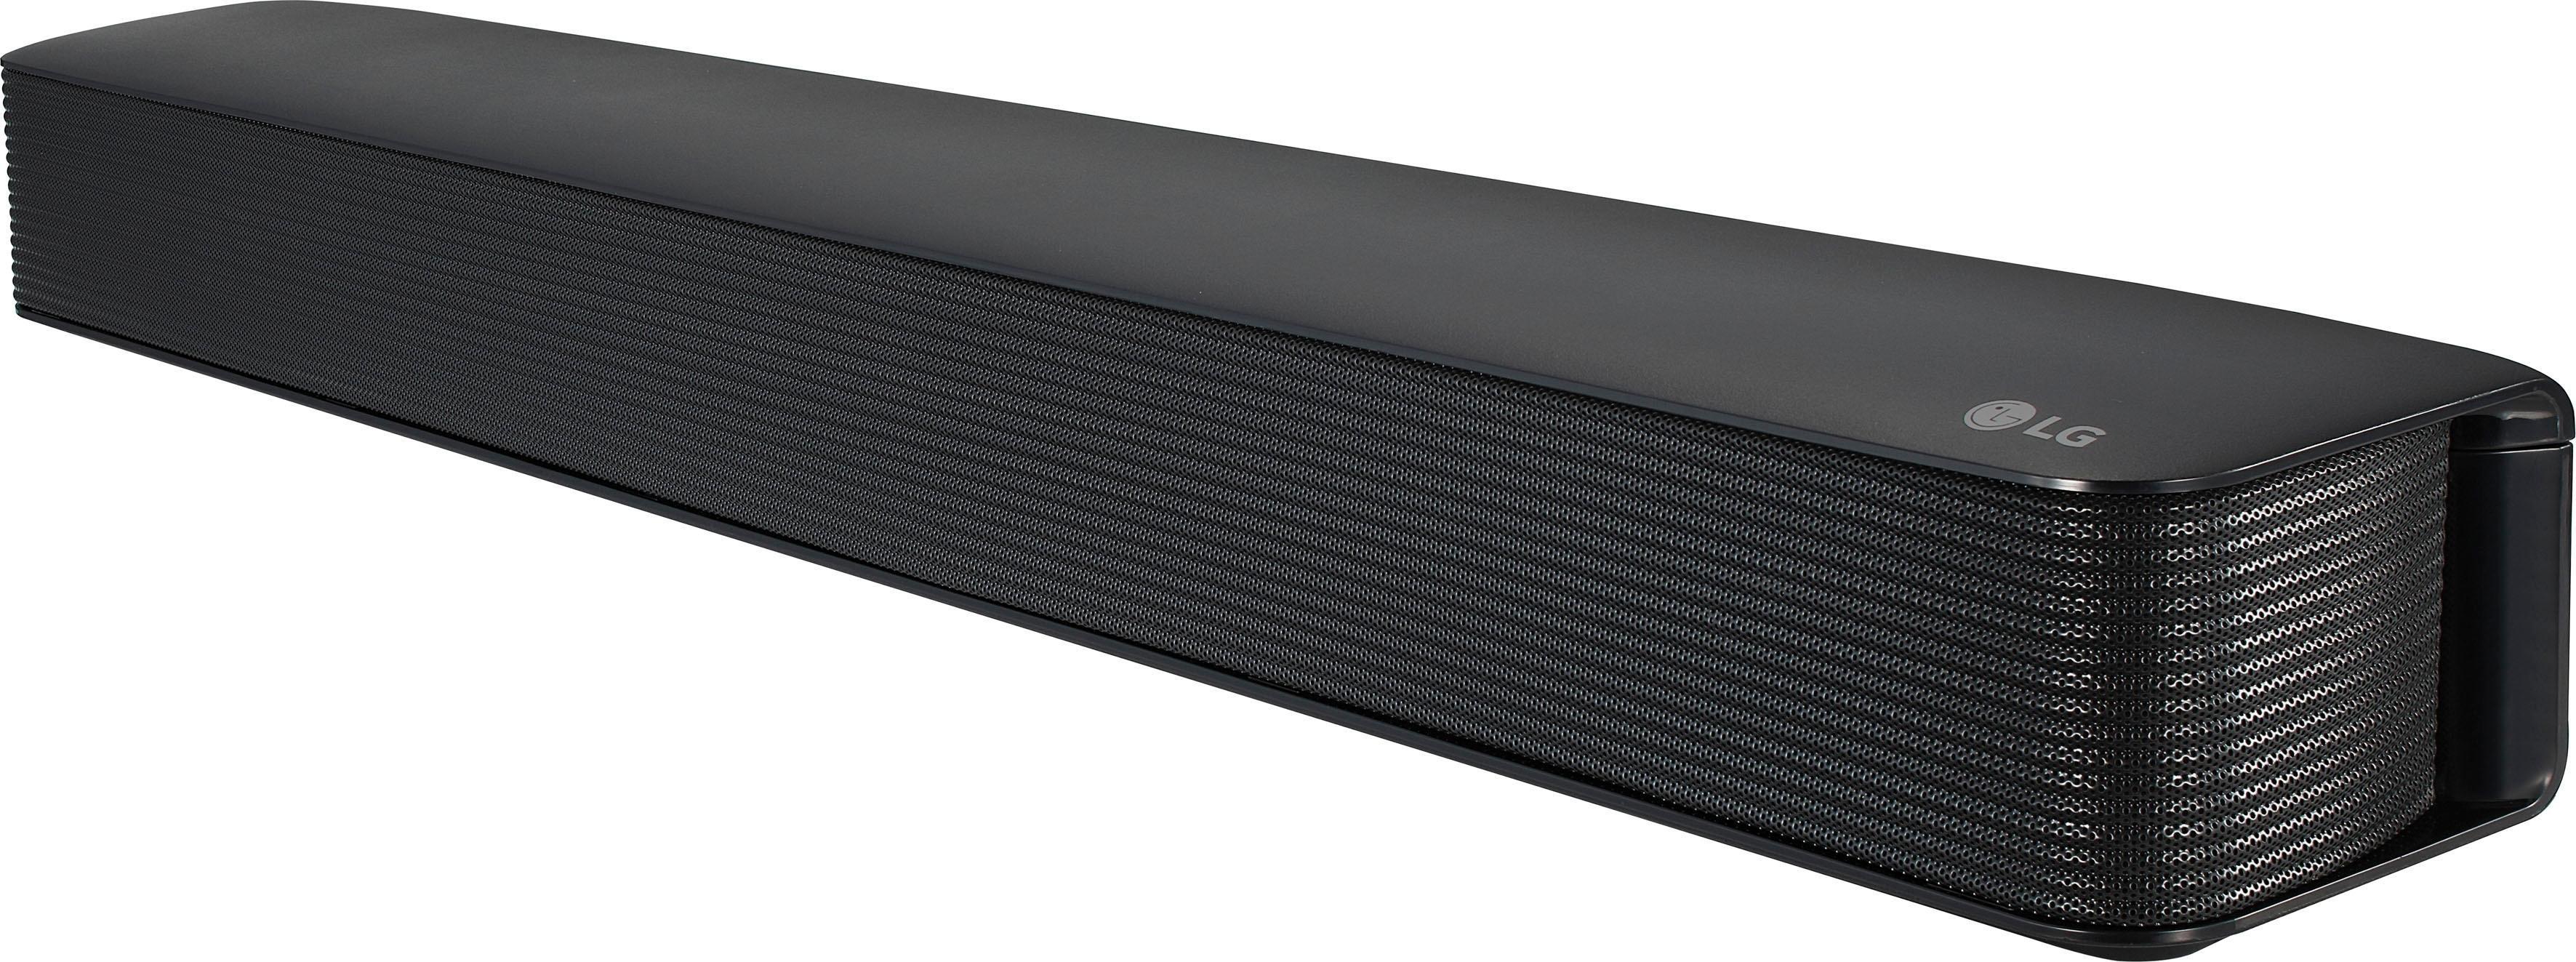 LG »SK1« 2.0 soundbar (bluetooth, 40 W) online kopen op otto.nl